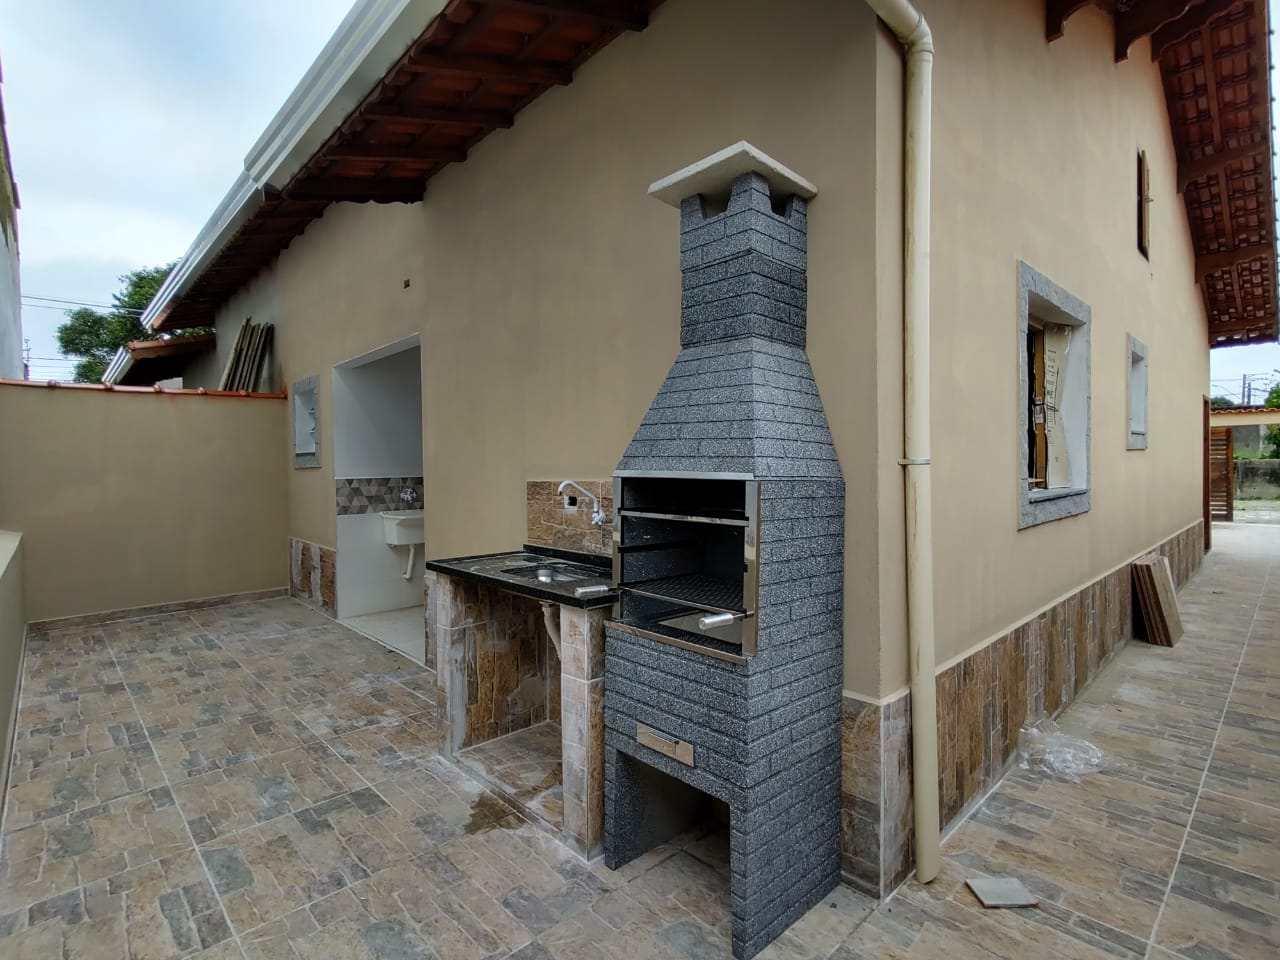 Casa com 2 dorms, Jardim Santa Terezinha, Itanhaém - R$ 299 mil, Cod: 279394